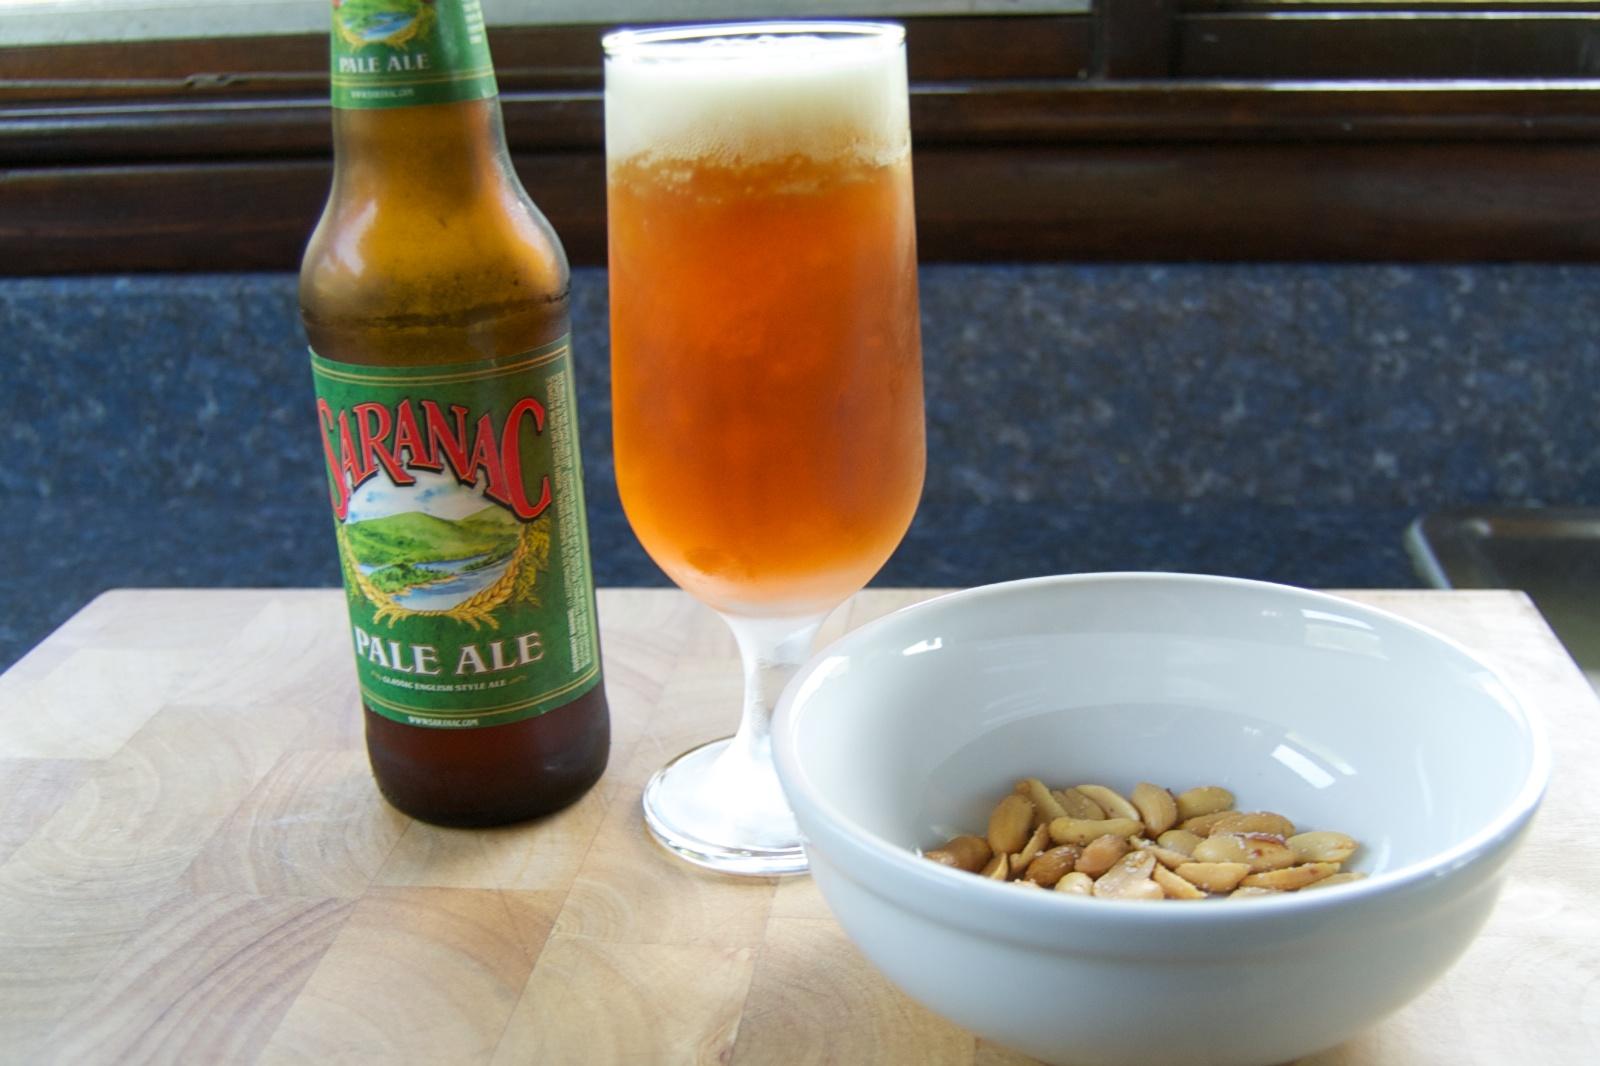 http://blog.rickk.com/food/2012/05/20/ate.2012.05.20.s.jpg